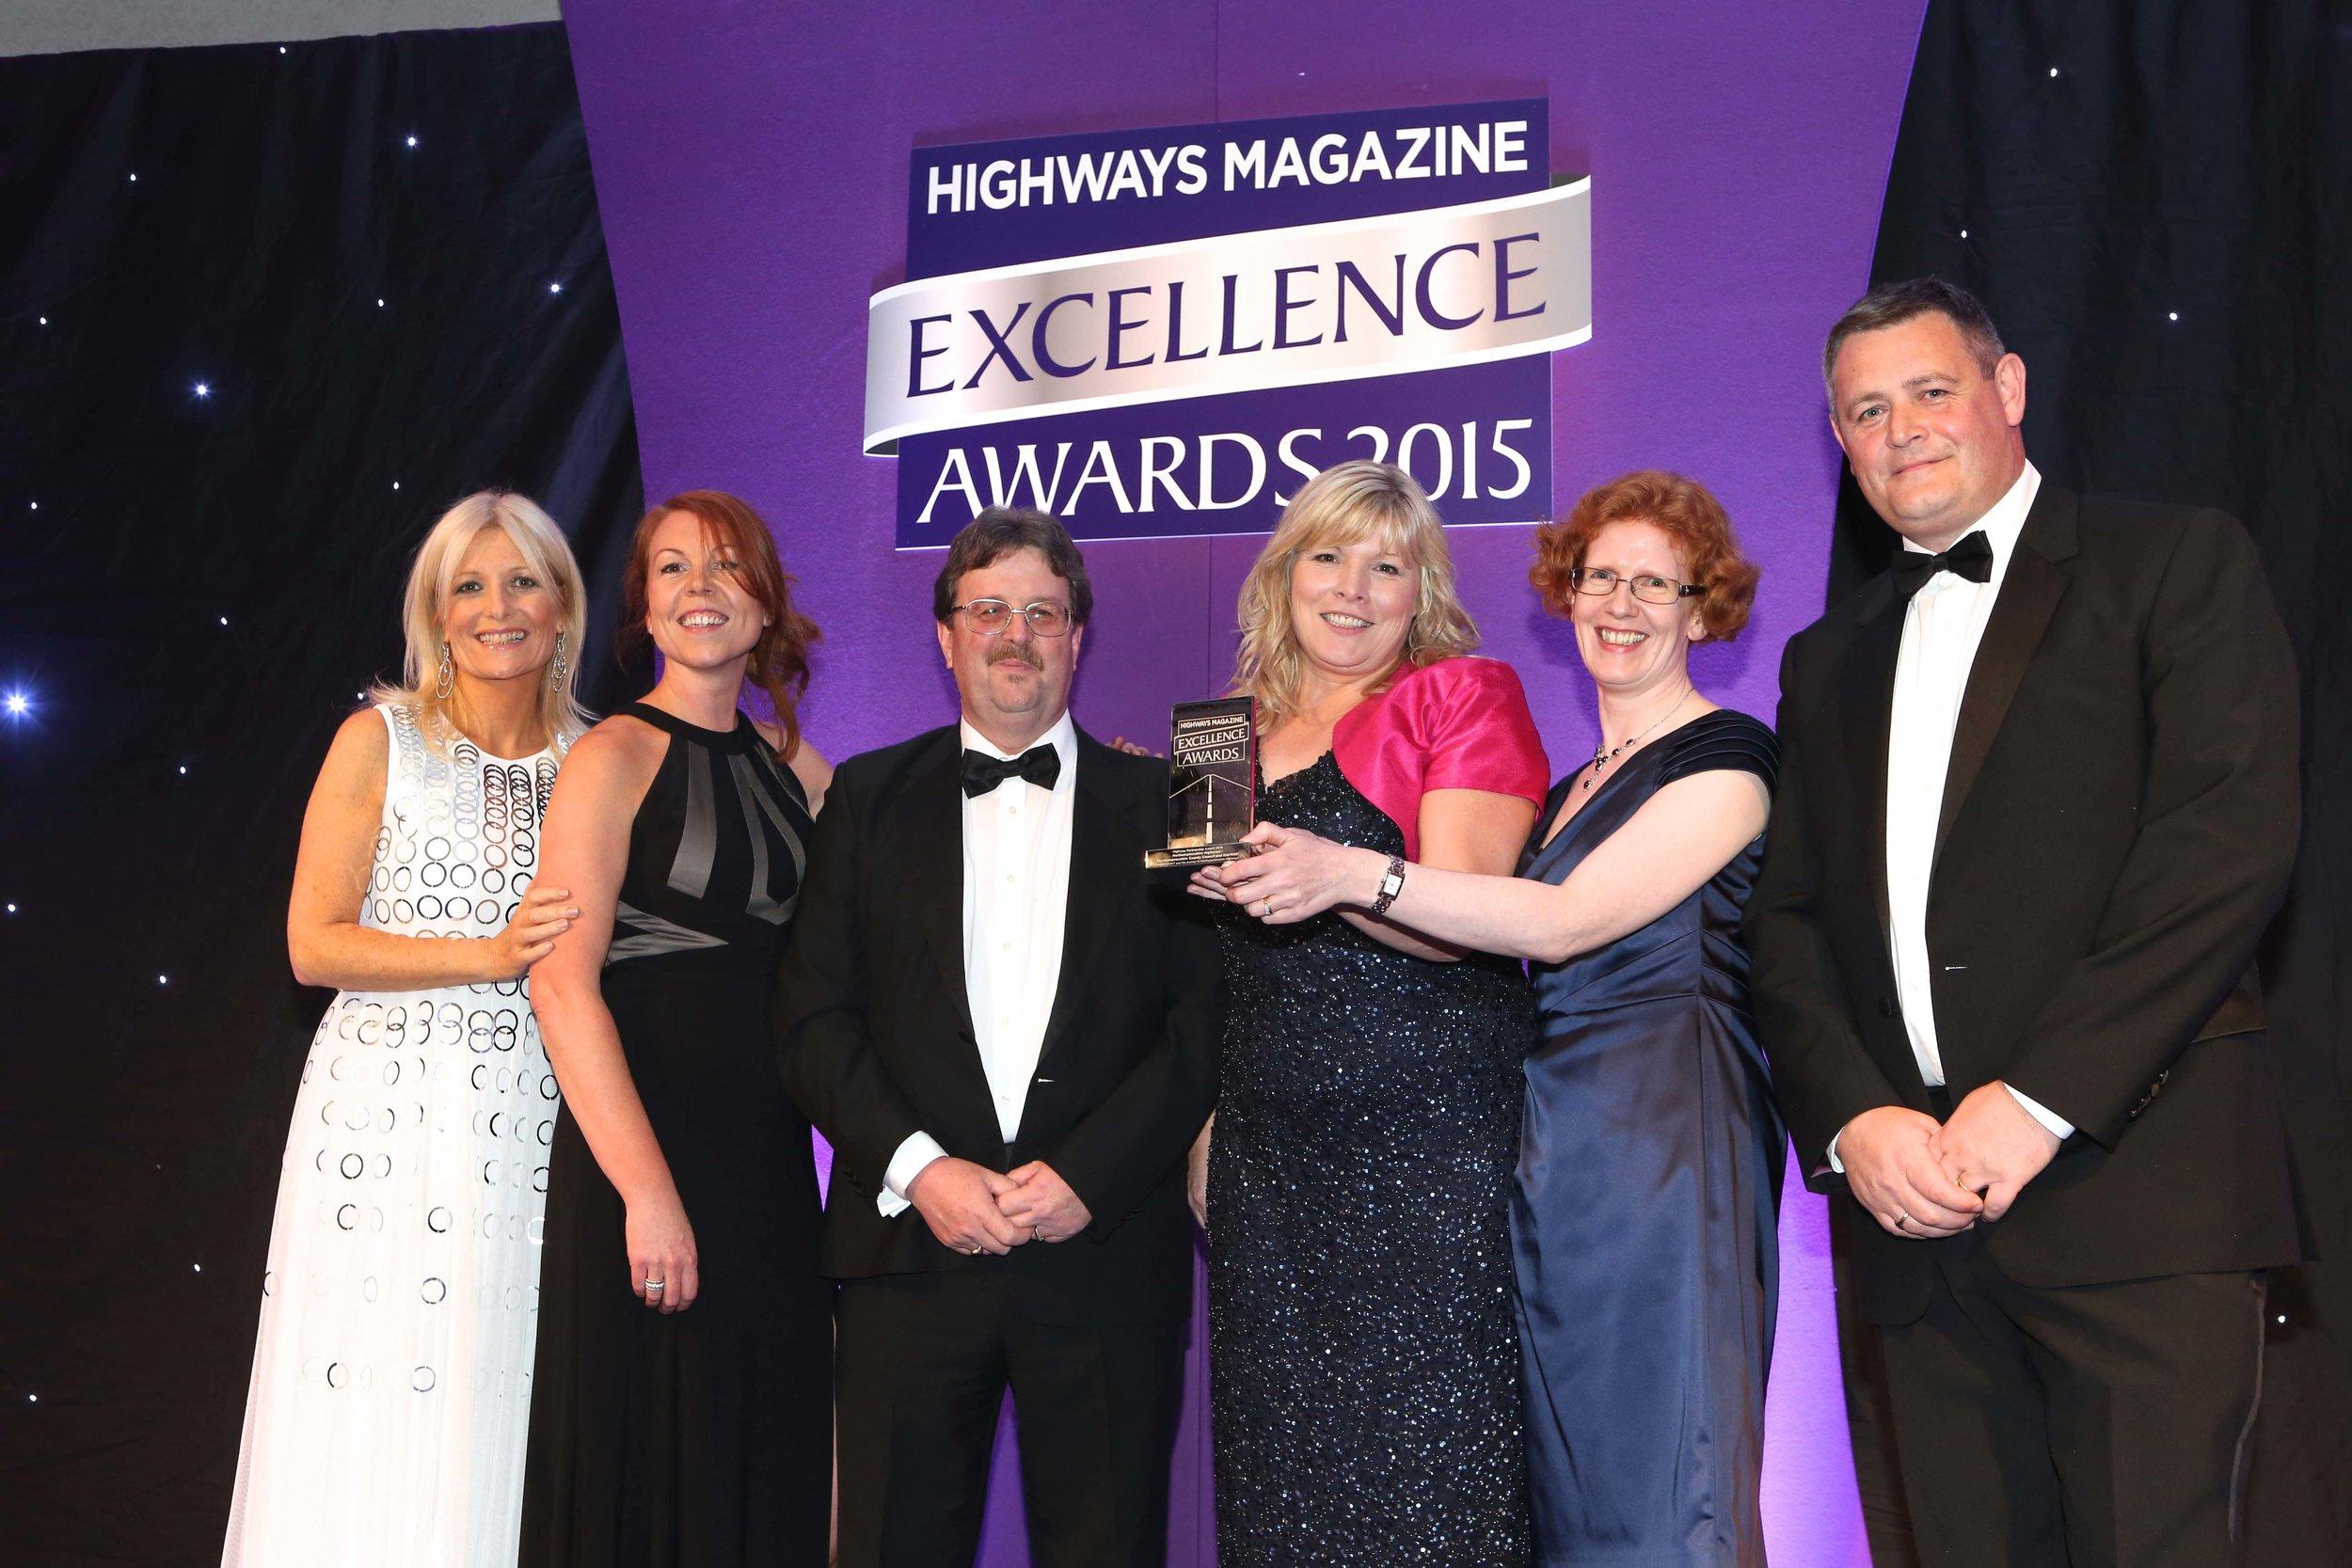 Highway mag partnership award 2015.jpg